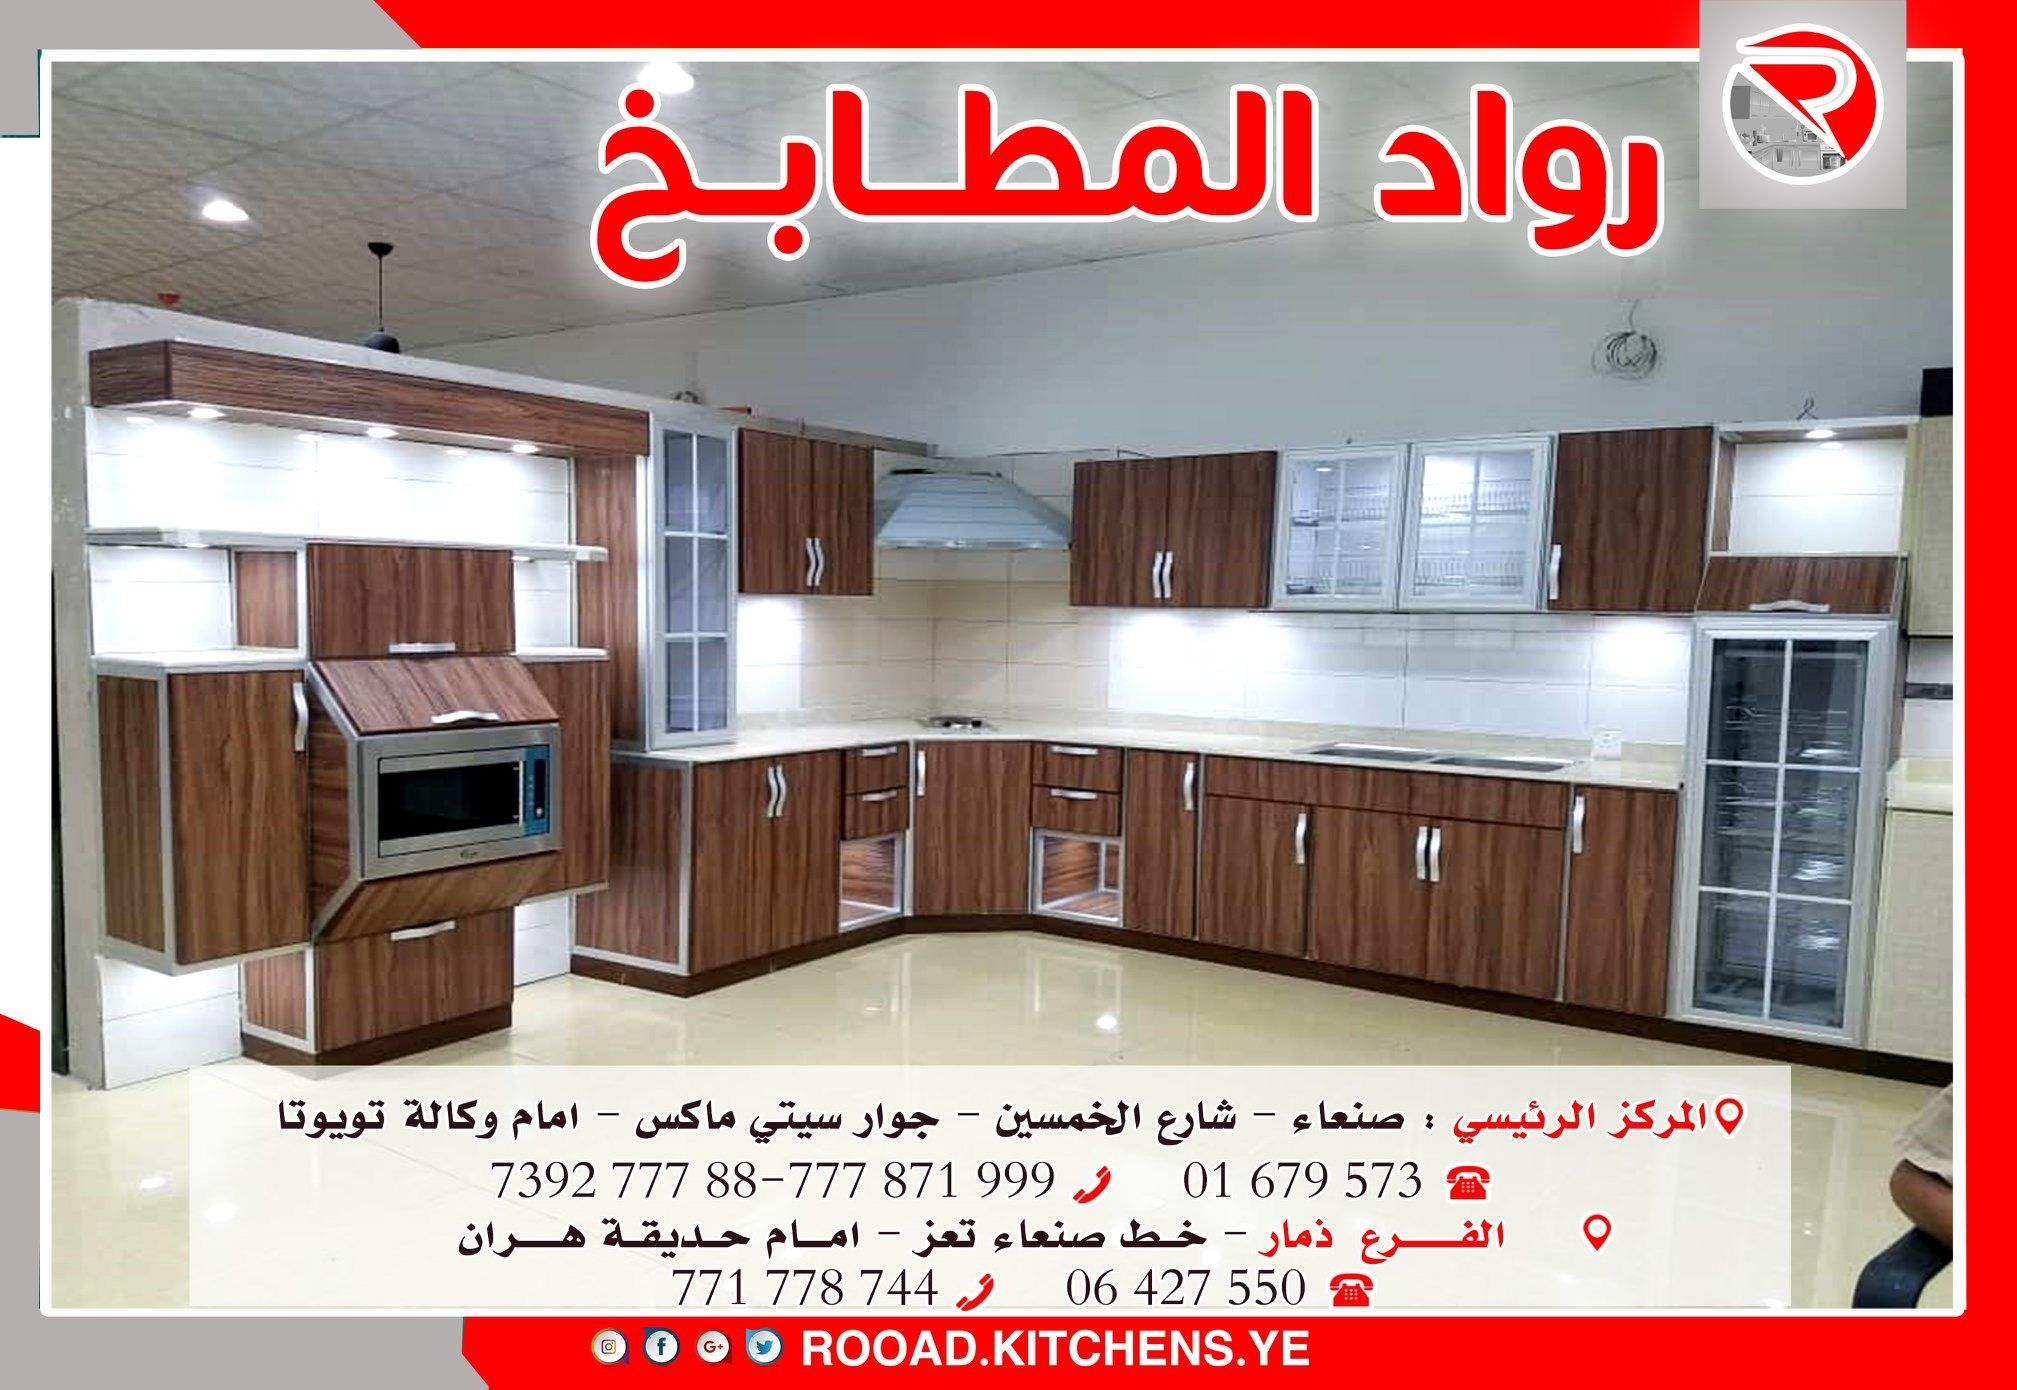 Pin By Ali On نجاره و رفوف وادوات Kitchen Cabinets Kitchen Decor